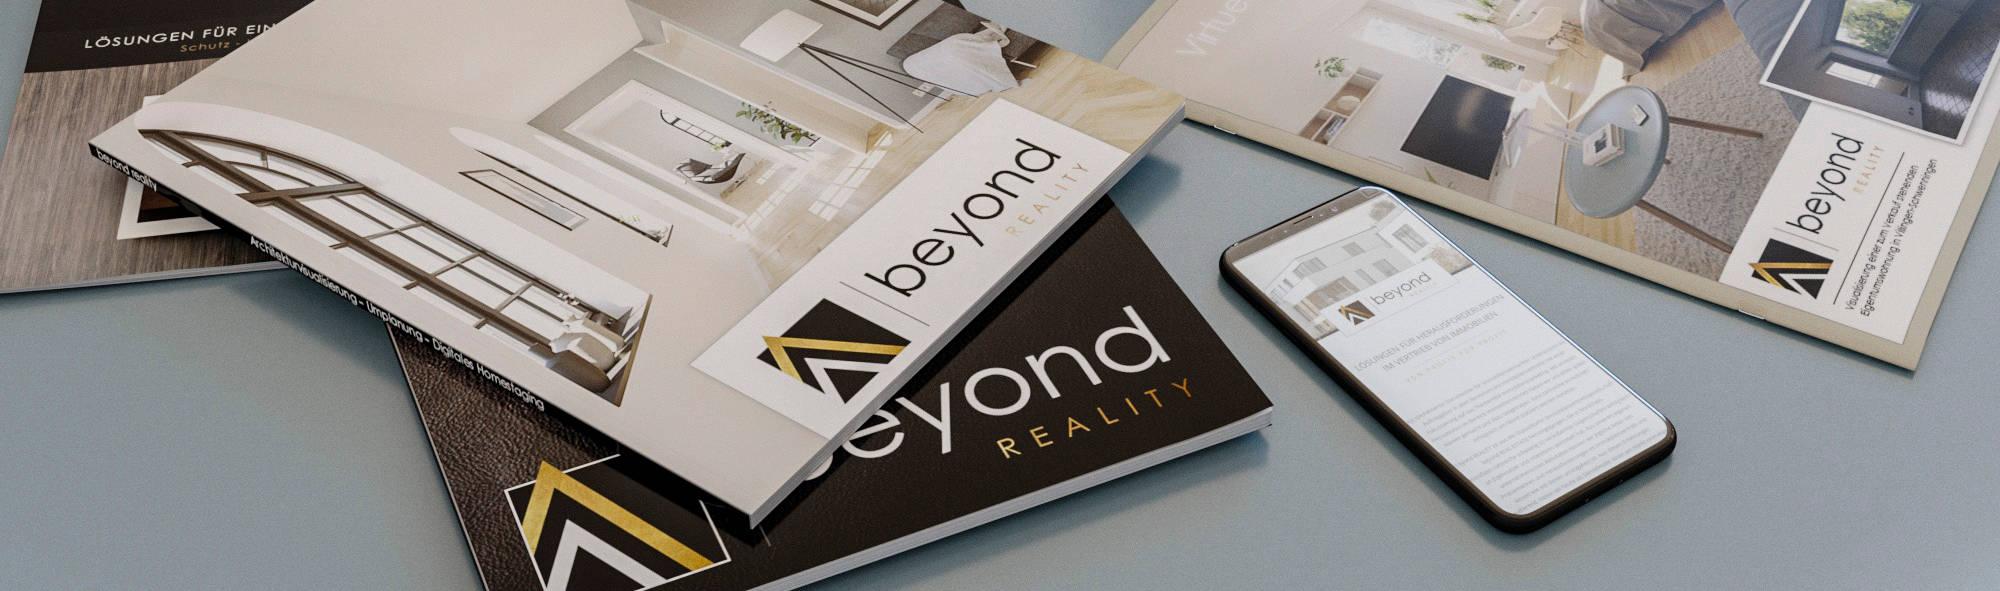 beyond REALITY | Architekturvisualisierung